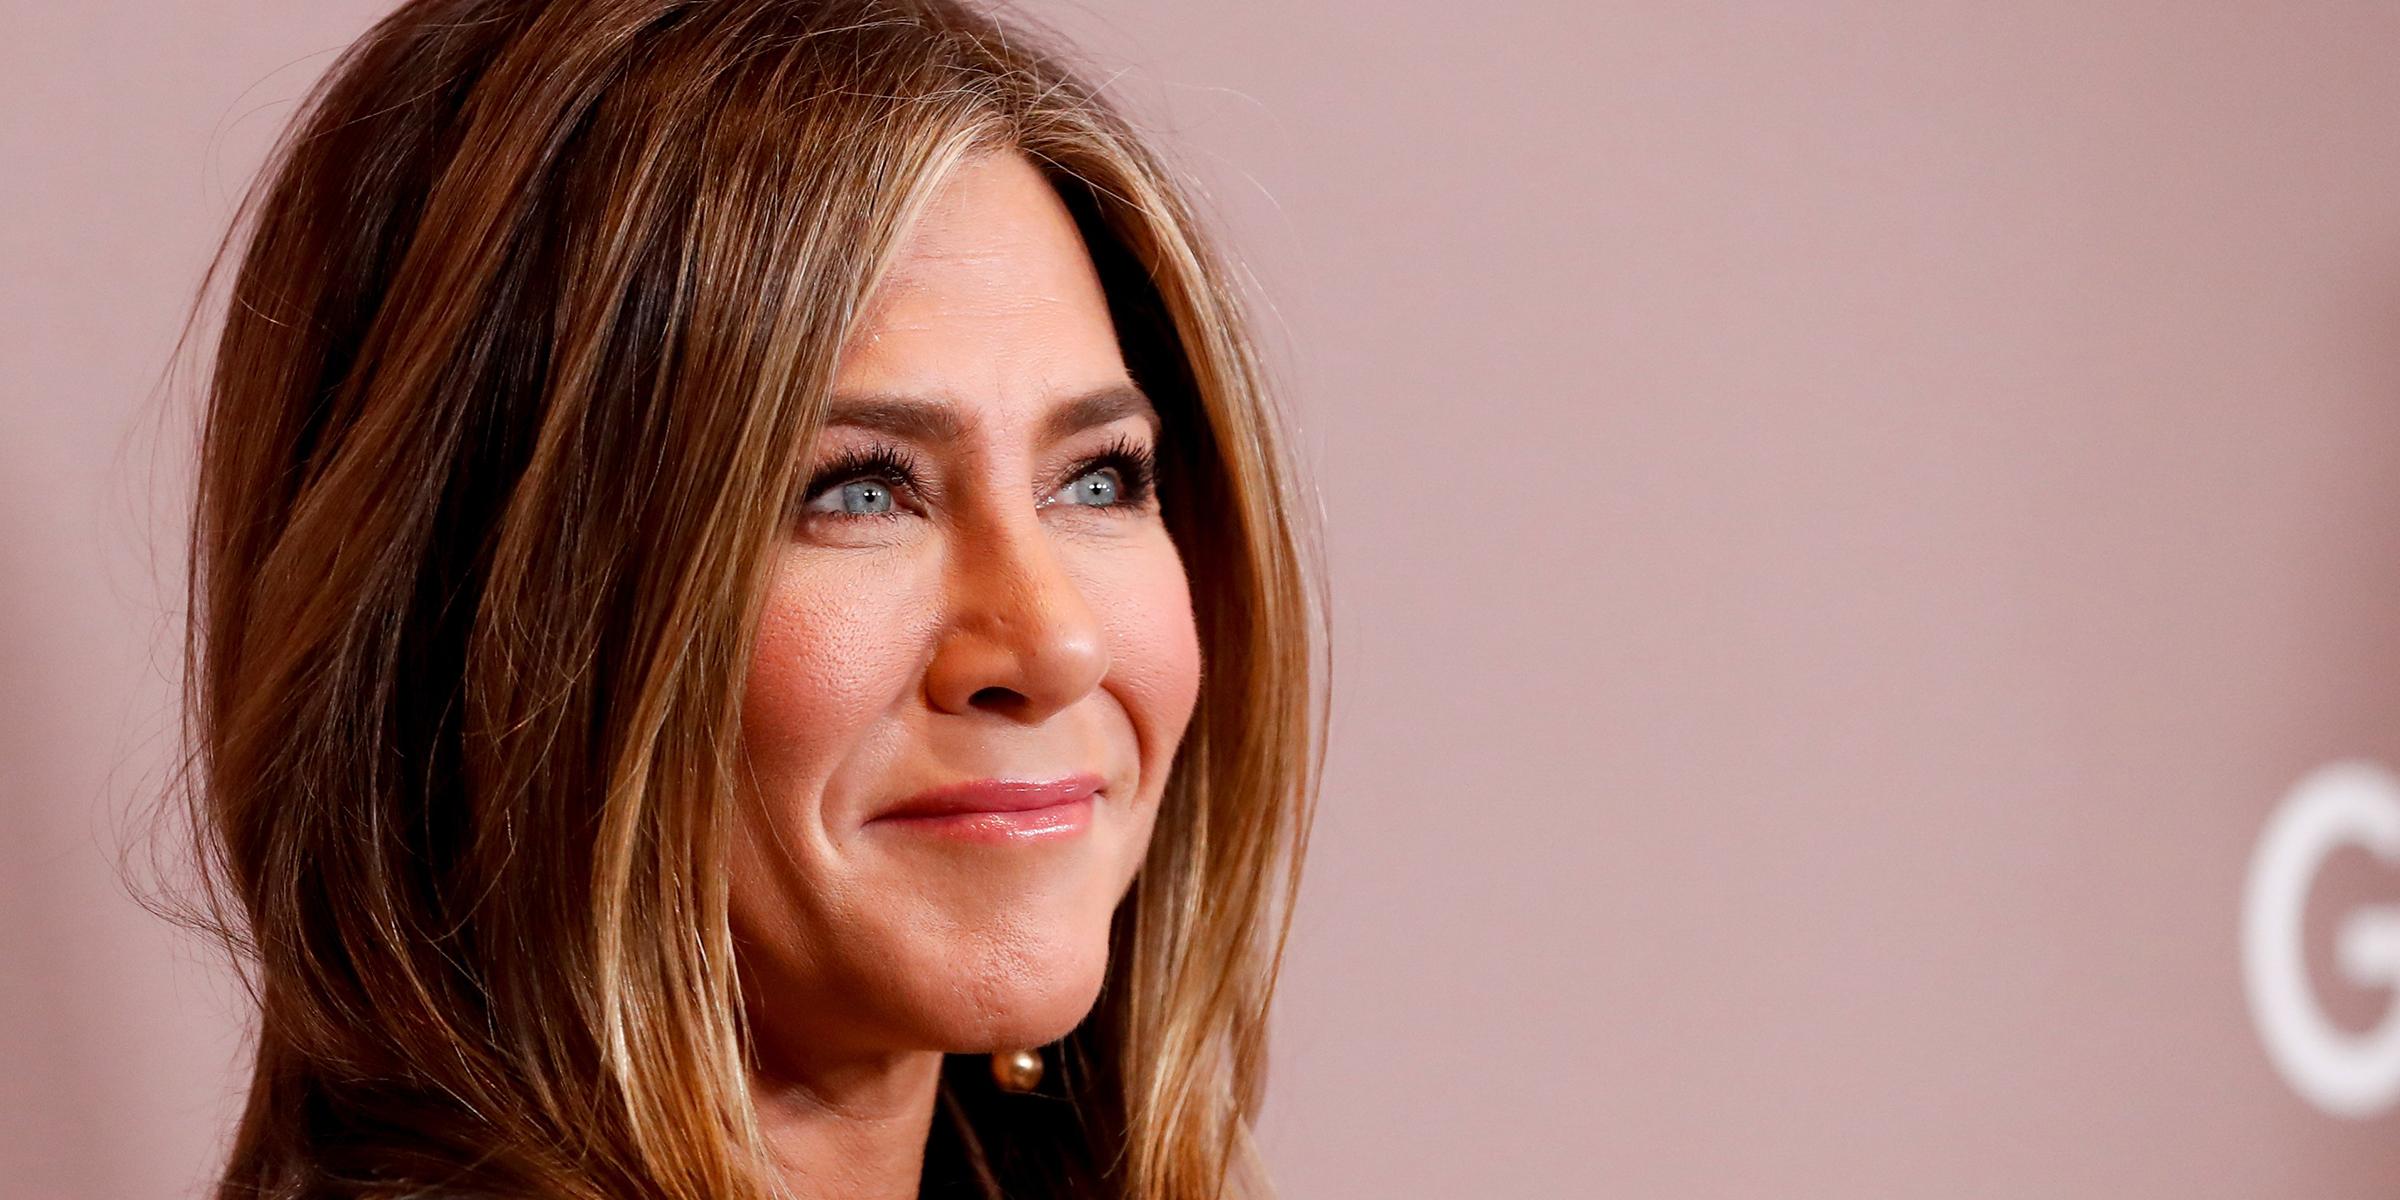 Jennifer Aniston shares honest photo behind the scenes before shoot